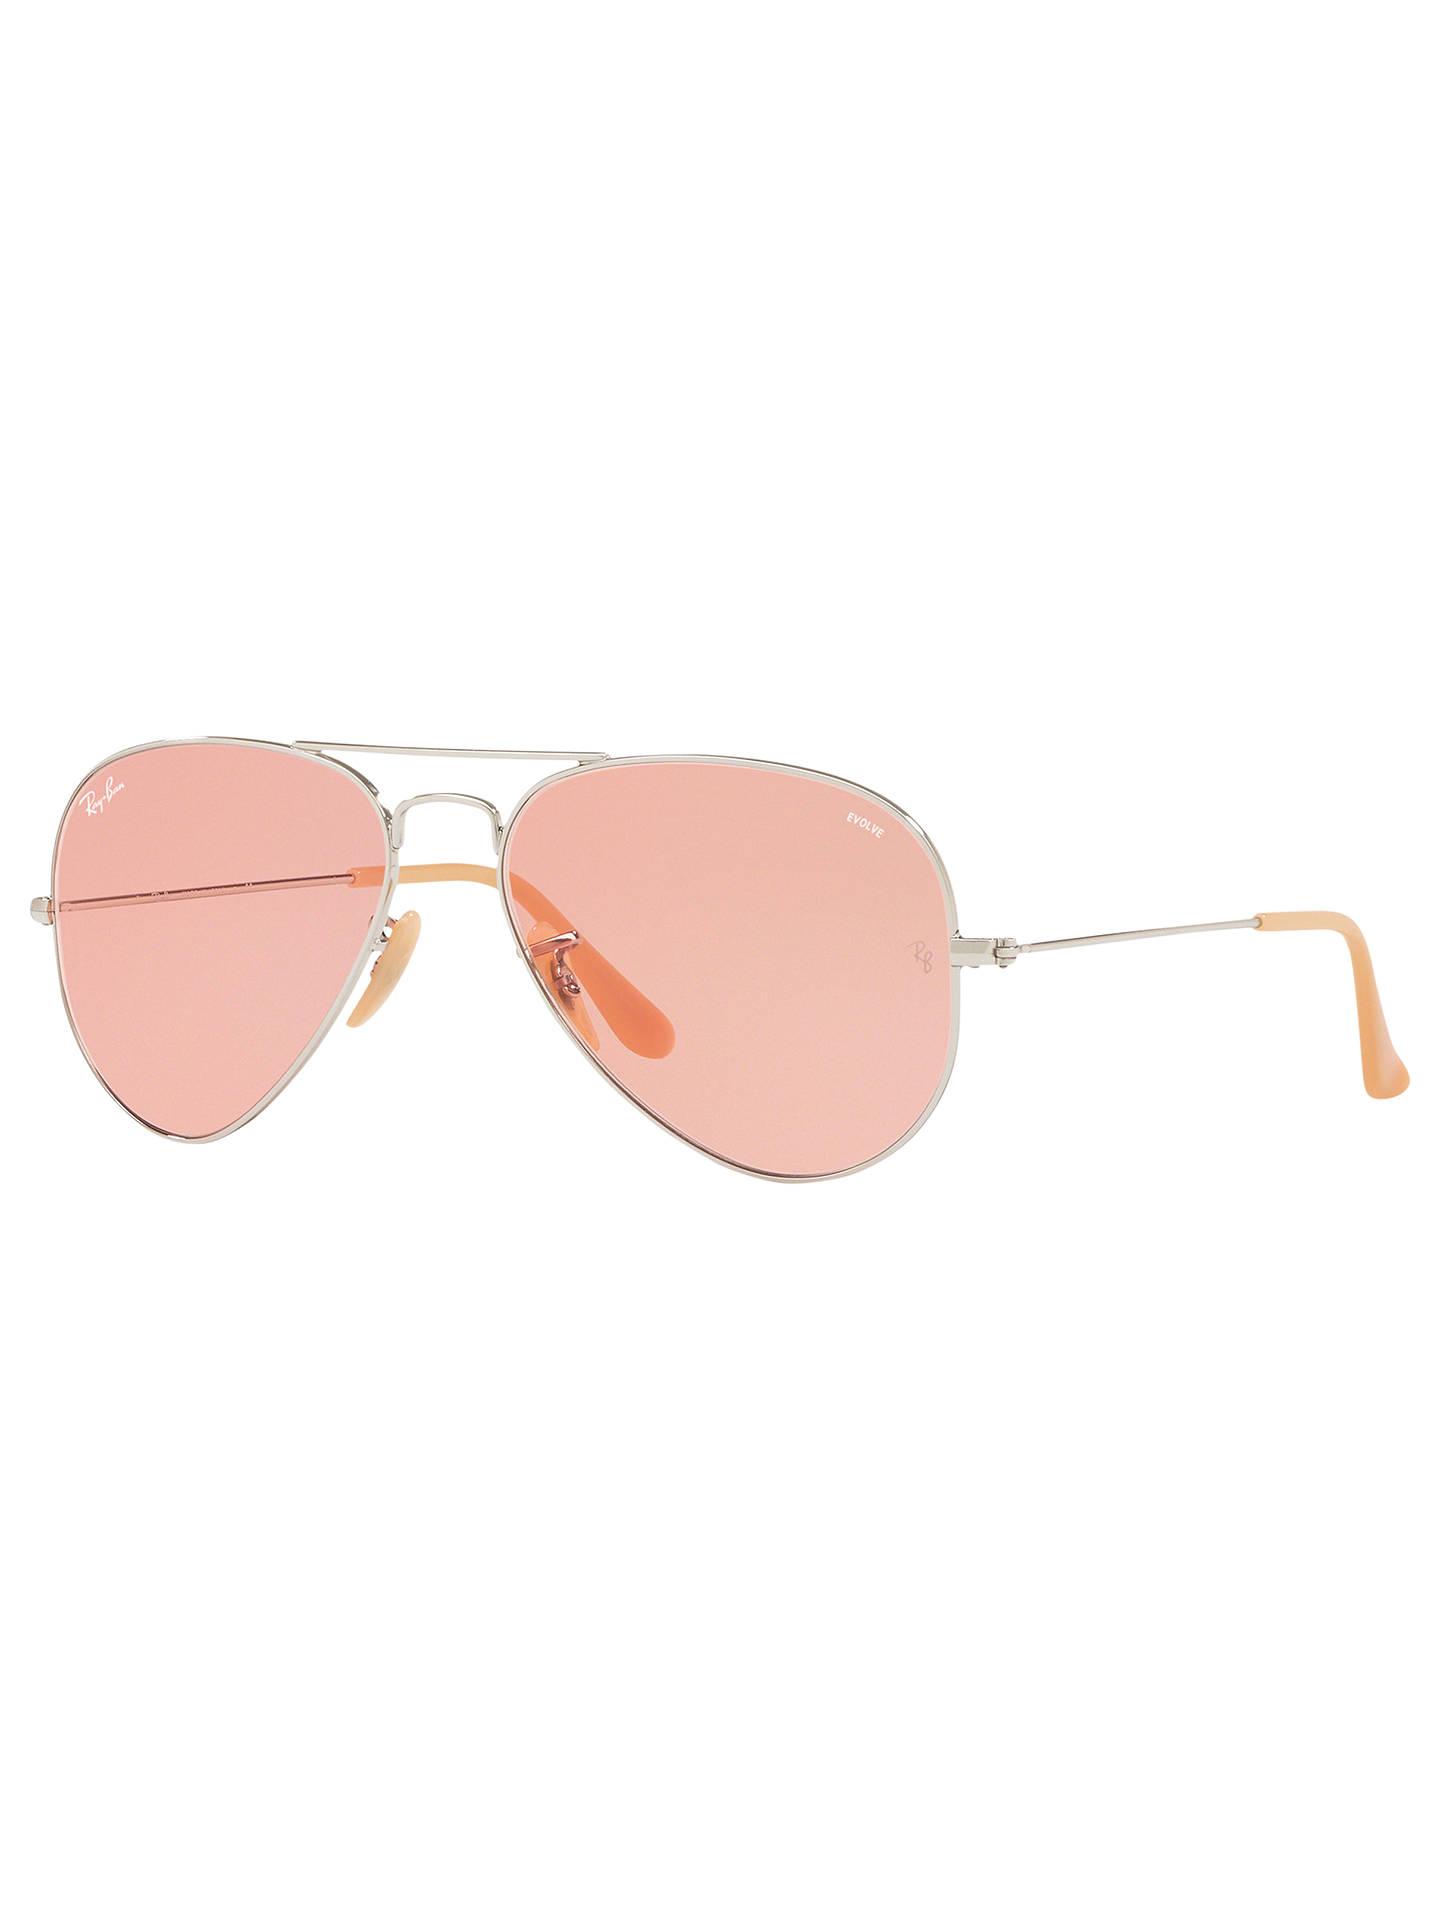 2b897da6b08ce Ray-Ban RB3025 Men s Evolve Original Aviator Sunglasses at John ...